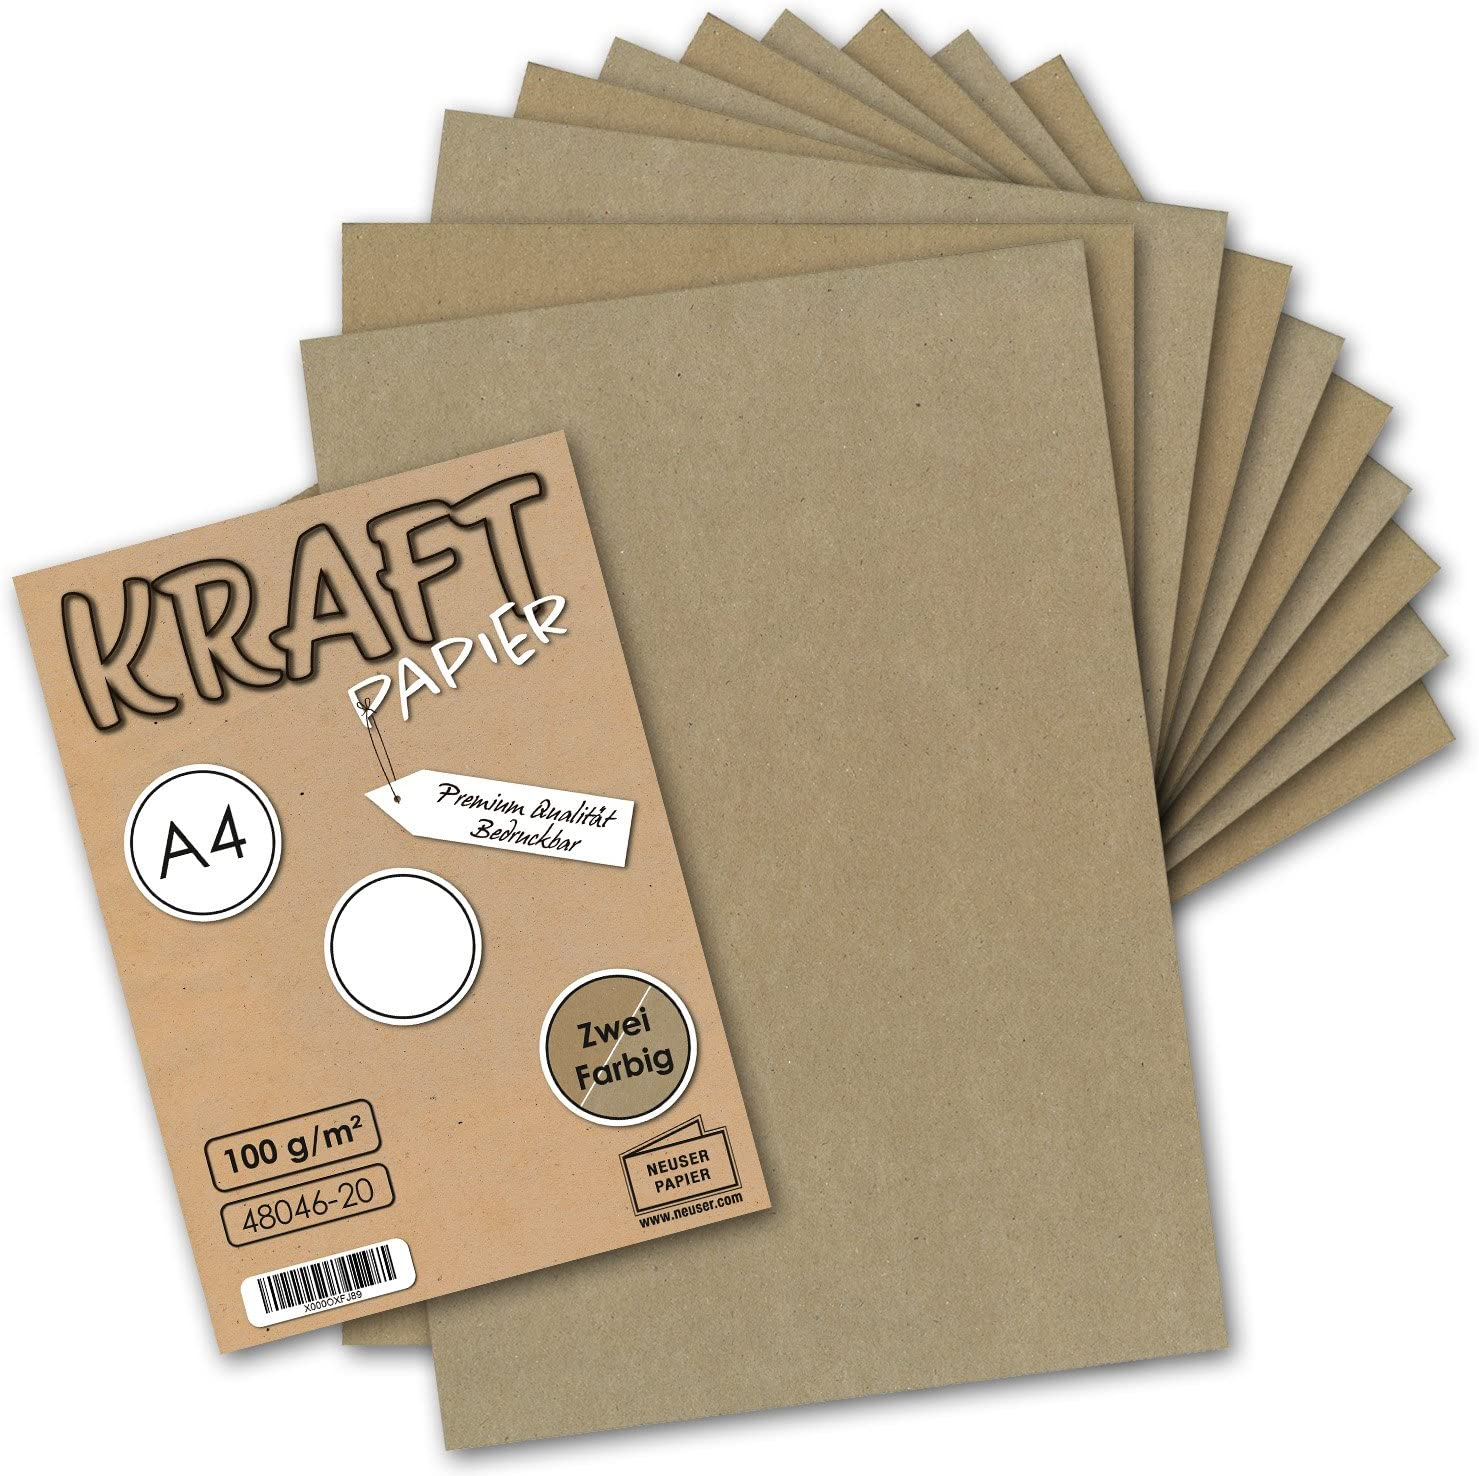 100/% /ökologisch Brief-Bogen Kunst /& K/ünstler-Papier 50x Vintage Kraftpapier DIN A4 100 g//m/² 2-farbig natur-braunes//graues Recycling-Papier